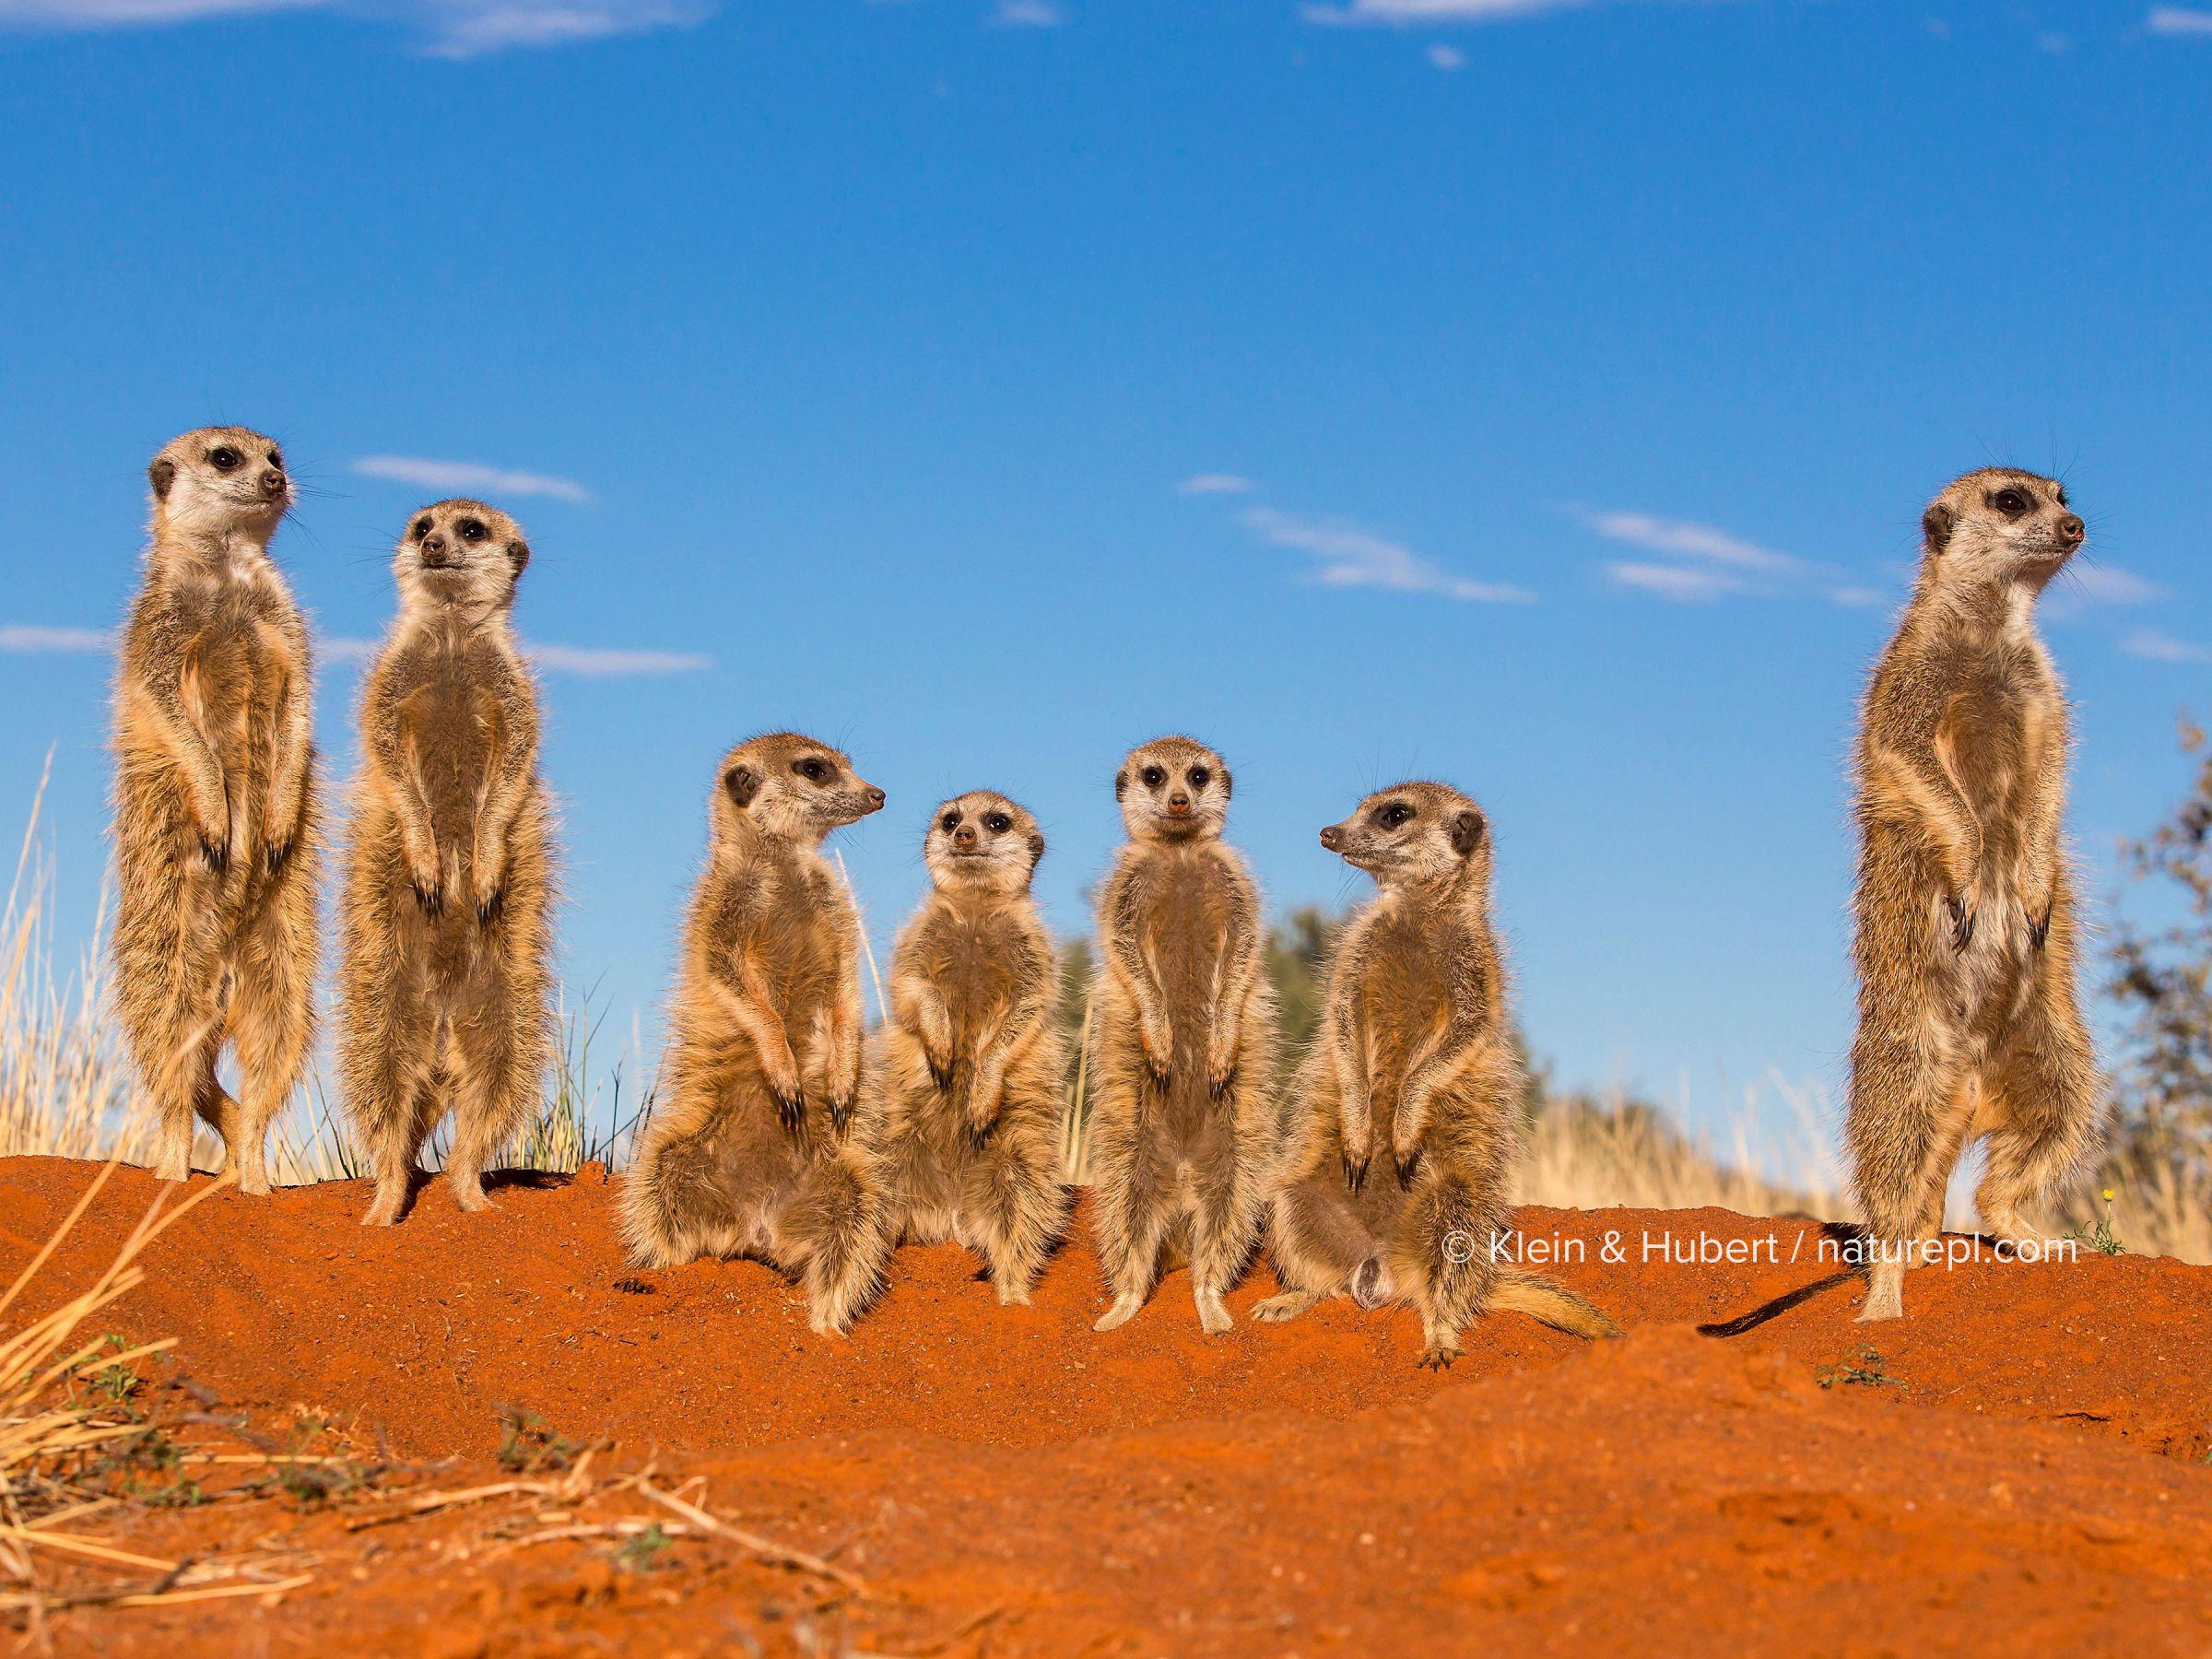 Meerkats (Suricata suricatta) standing on the burrow, warming up while facing the sun, Kalahari Desert, South Africa.